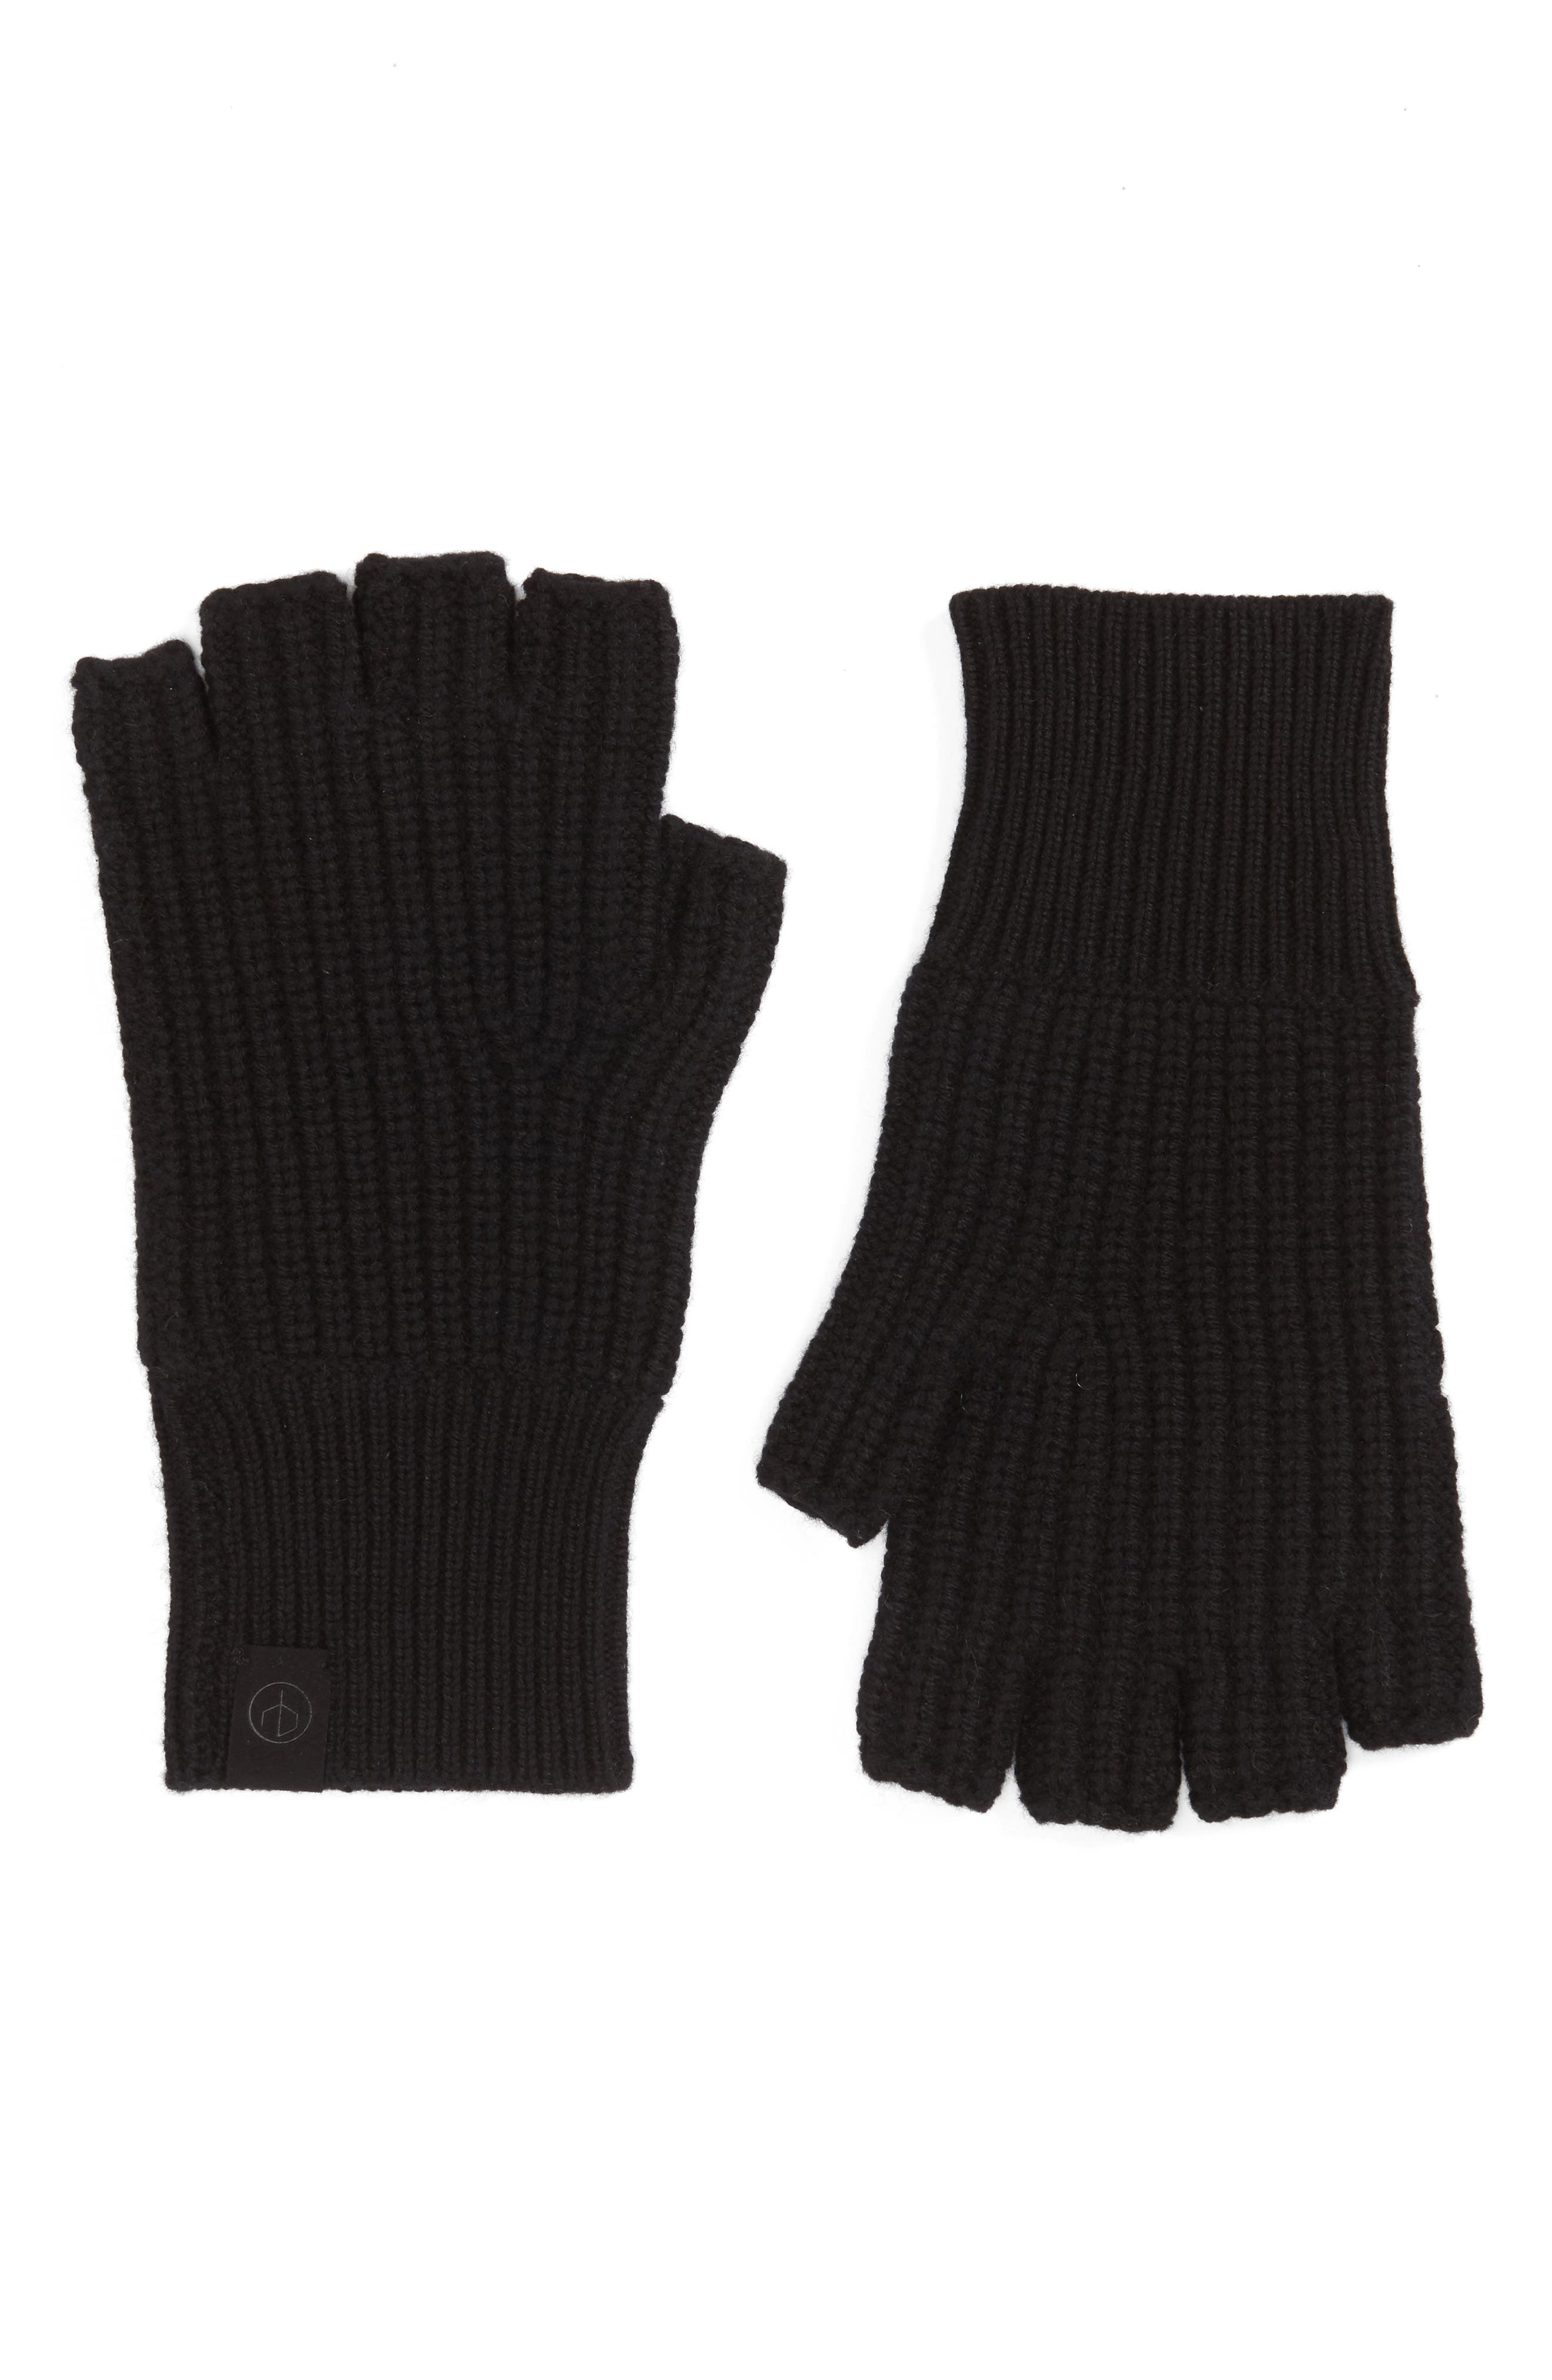 Alternate Image 1 Selected - rag & bone Ace Cashmere Knit Fingerless Gloves